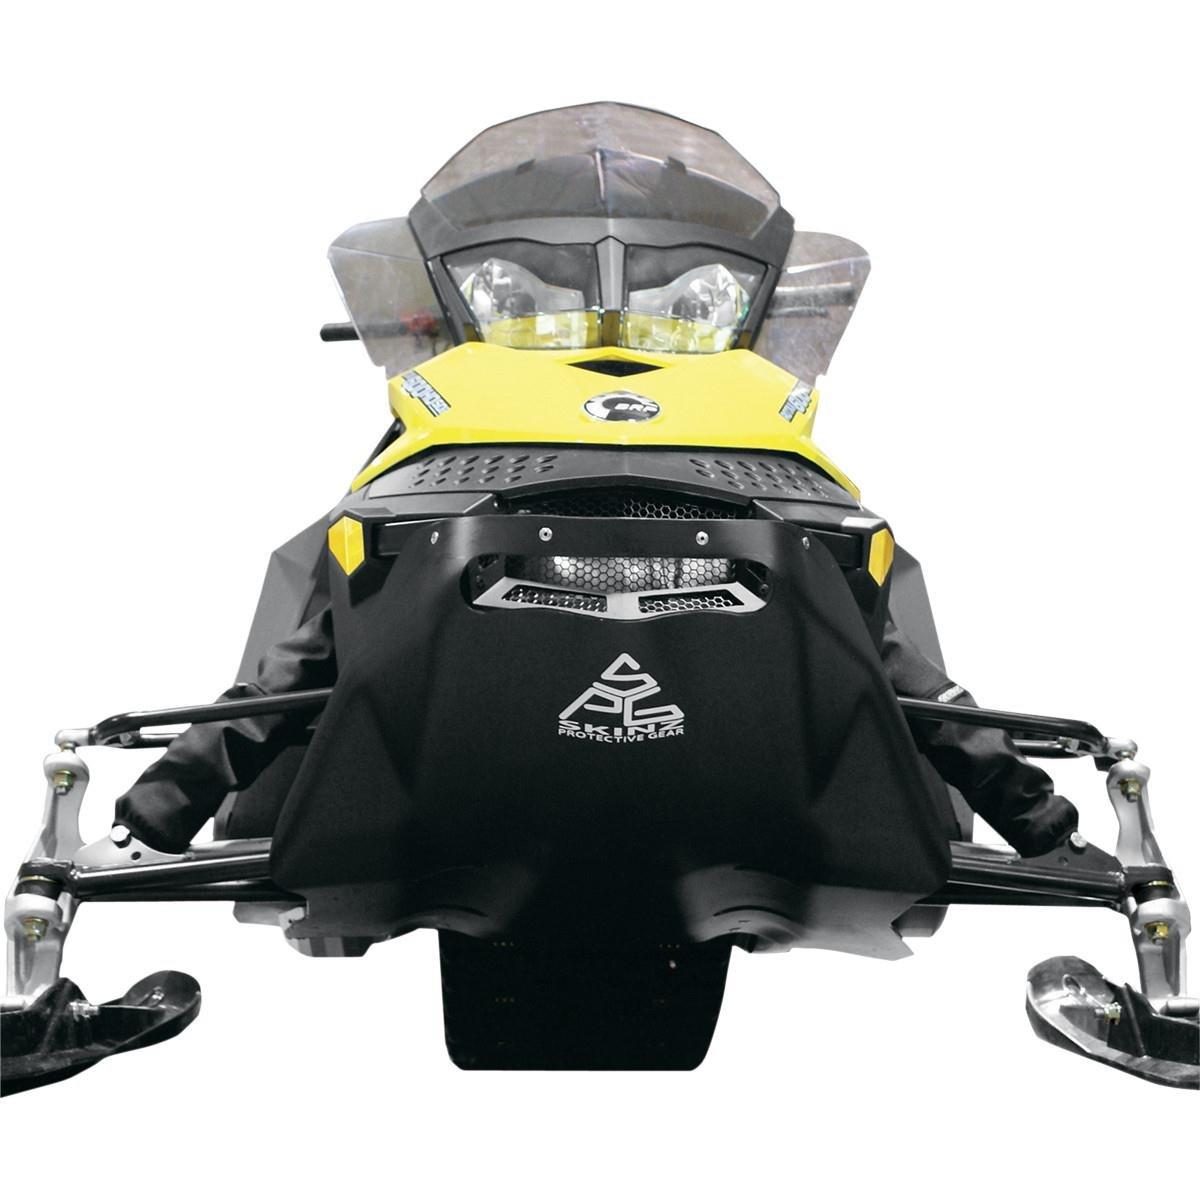 Skinz Protective Gear Float Plate - Black SDFP400-BK TRTB2110